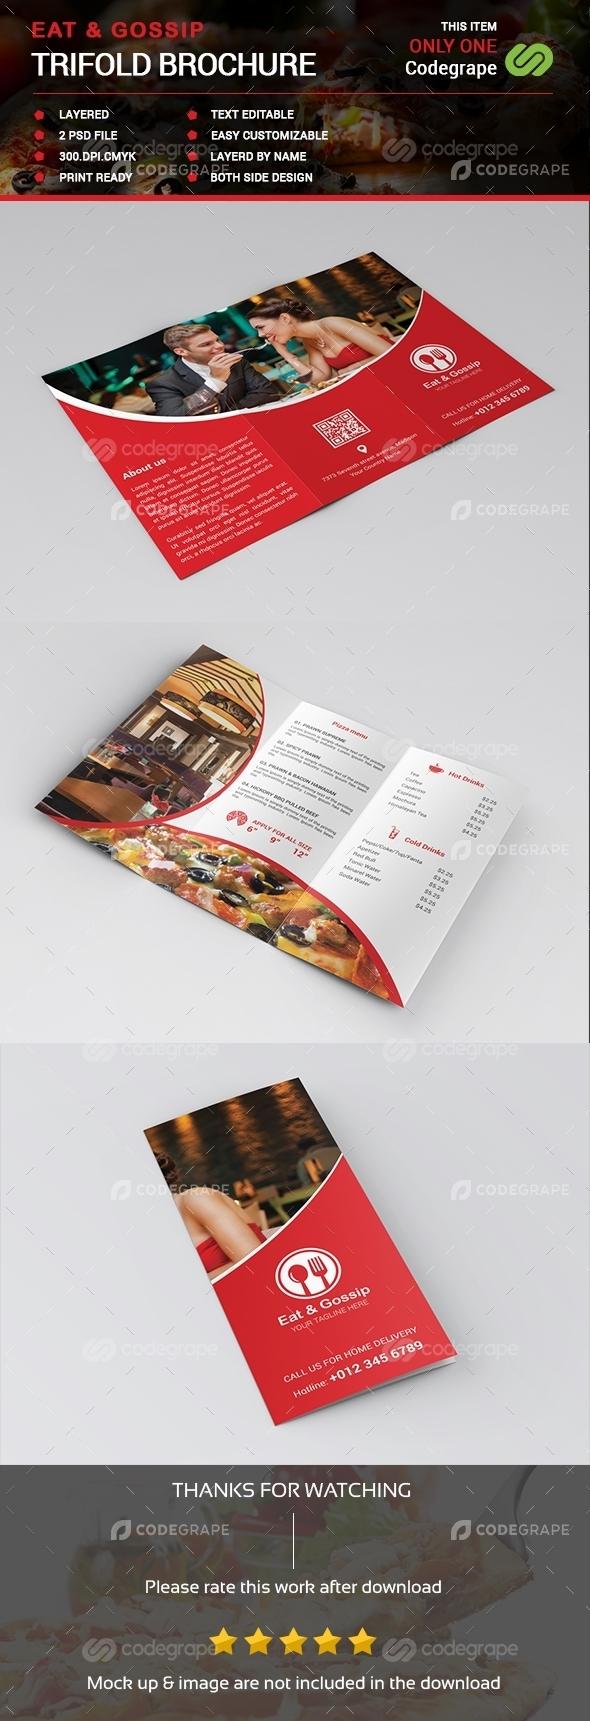 Eat & Gossip Trifold Brochure / Menu